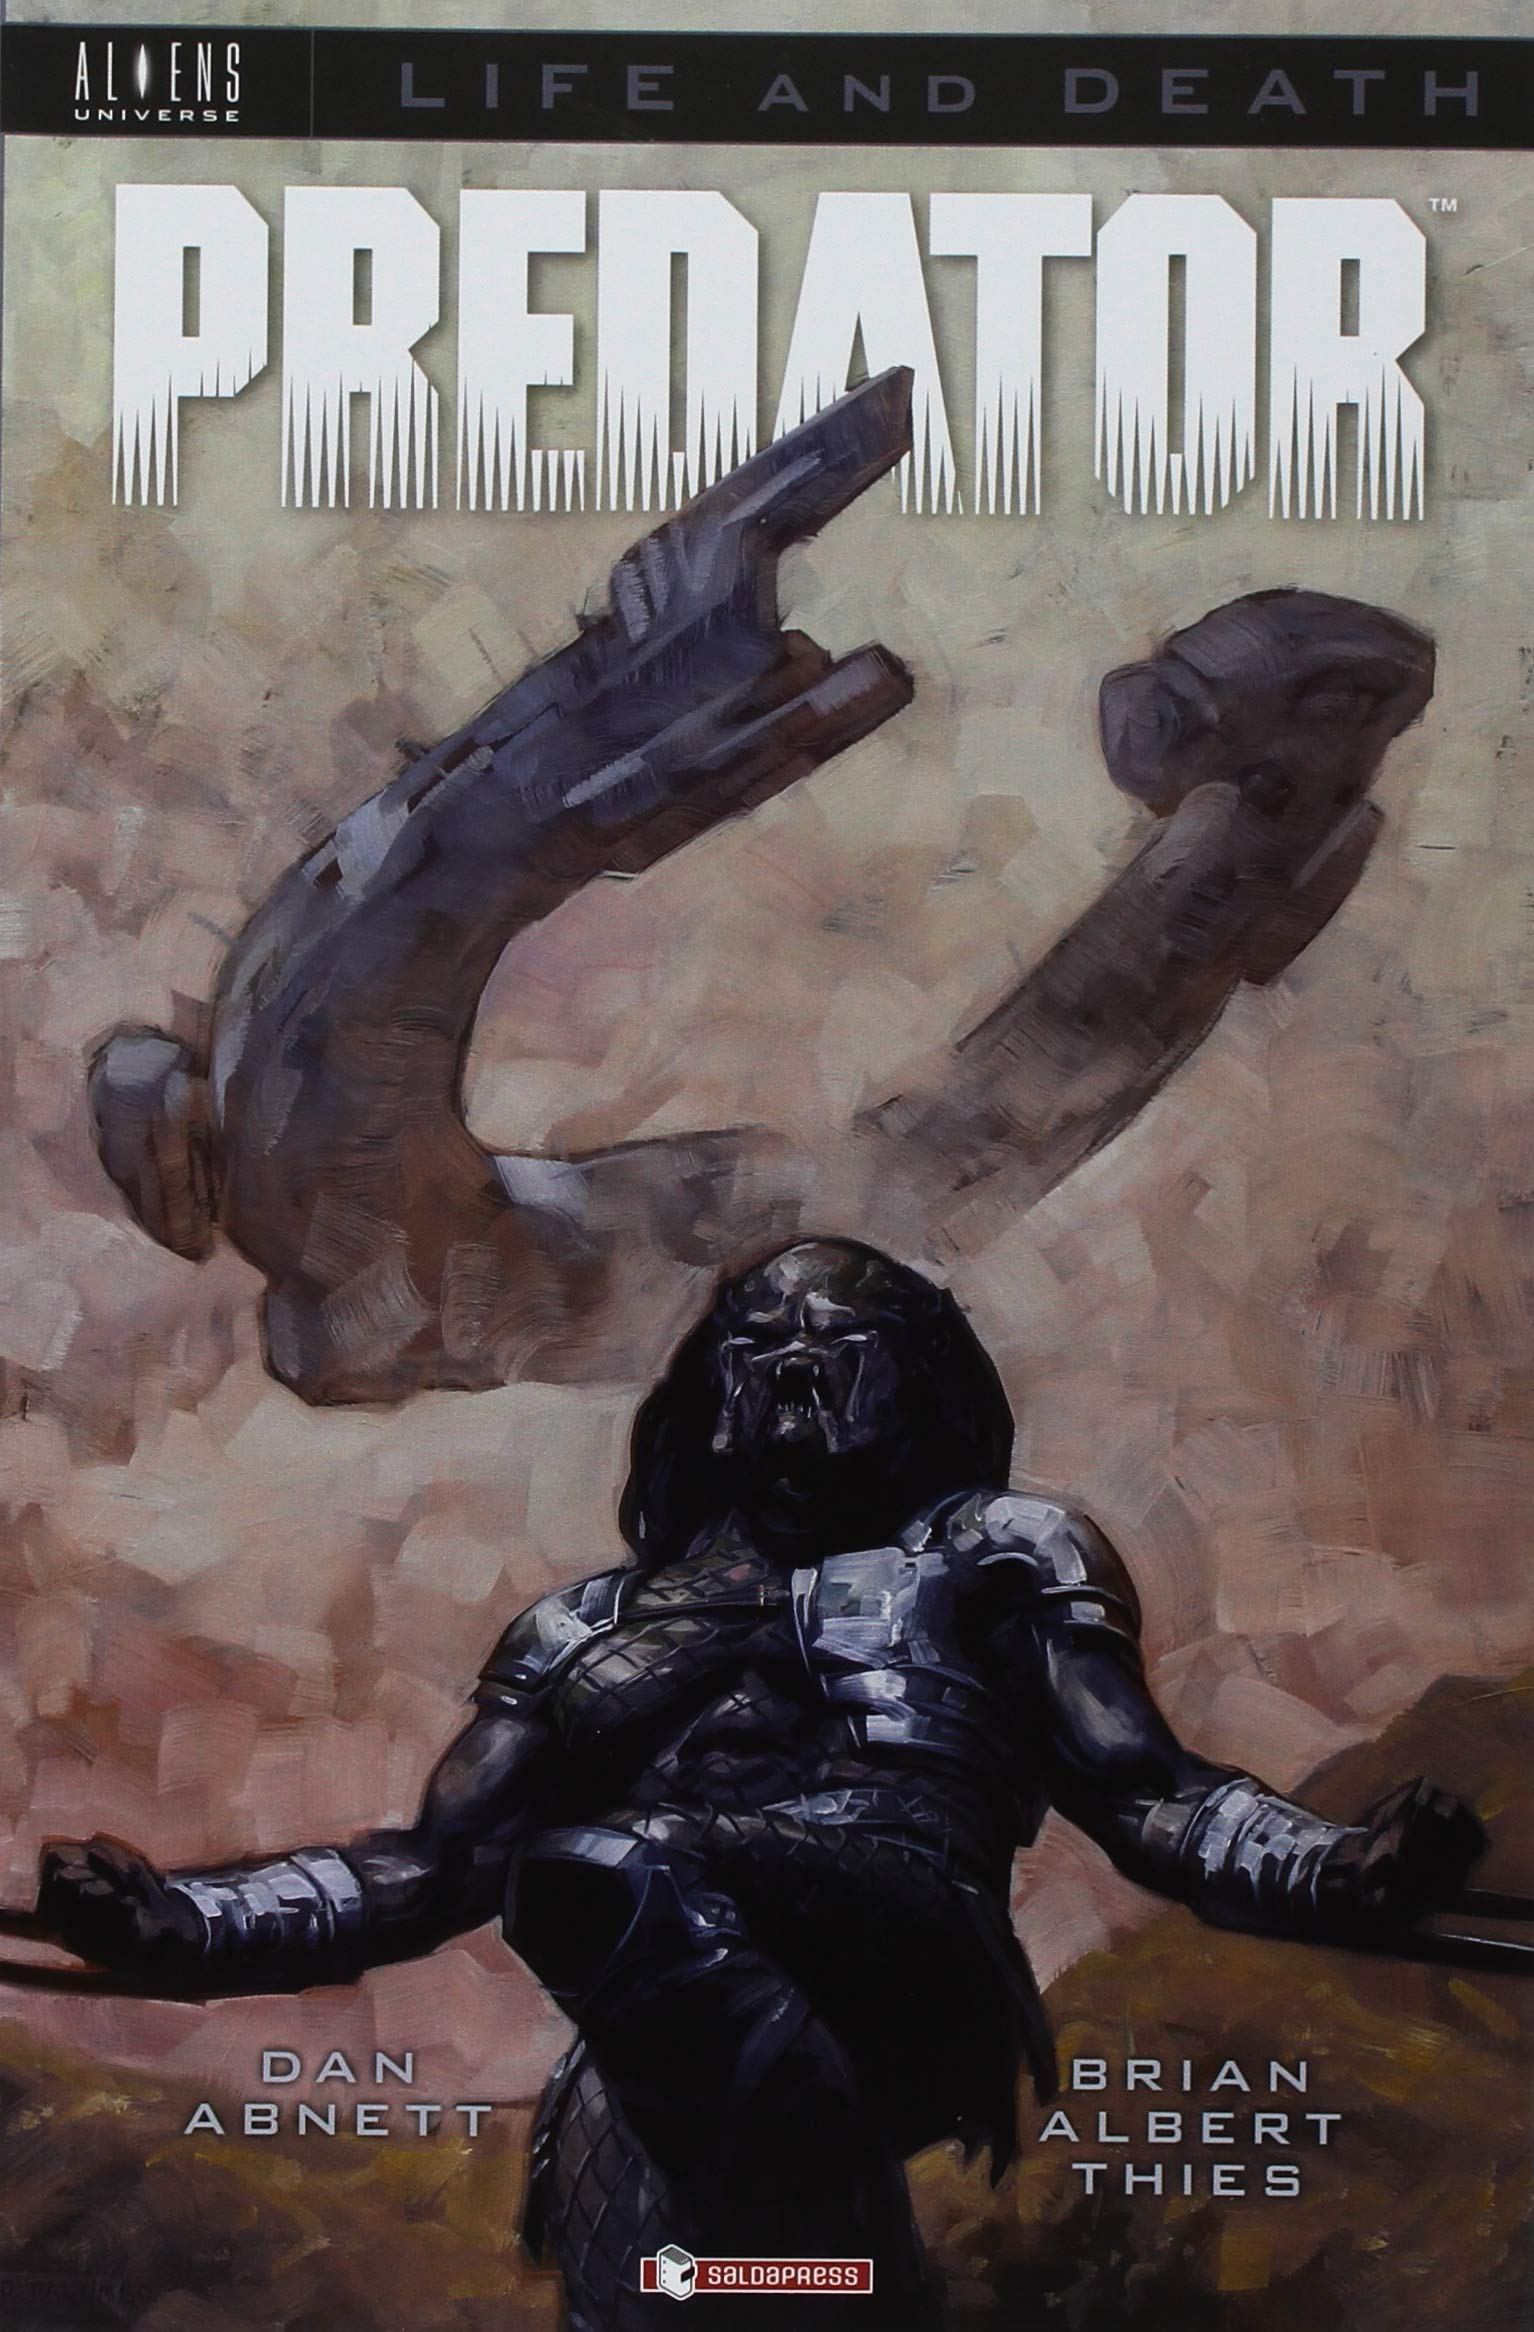 Predator. Life and death: 1 Copertina flessibile – 13 set 2018 Dan Abnett Brian Albert Thies S. Menchetti SaldaPress